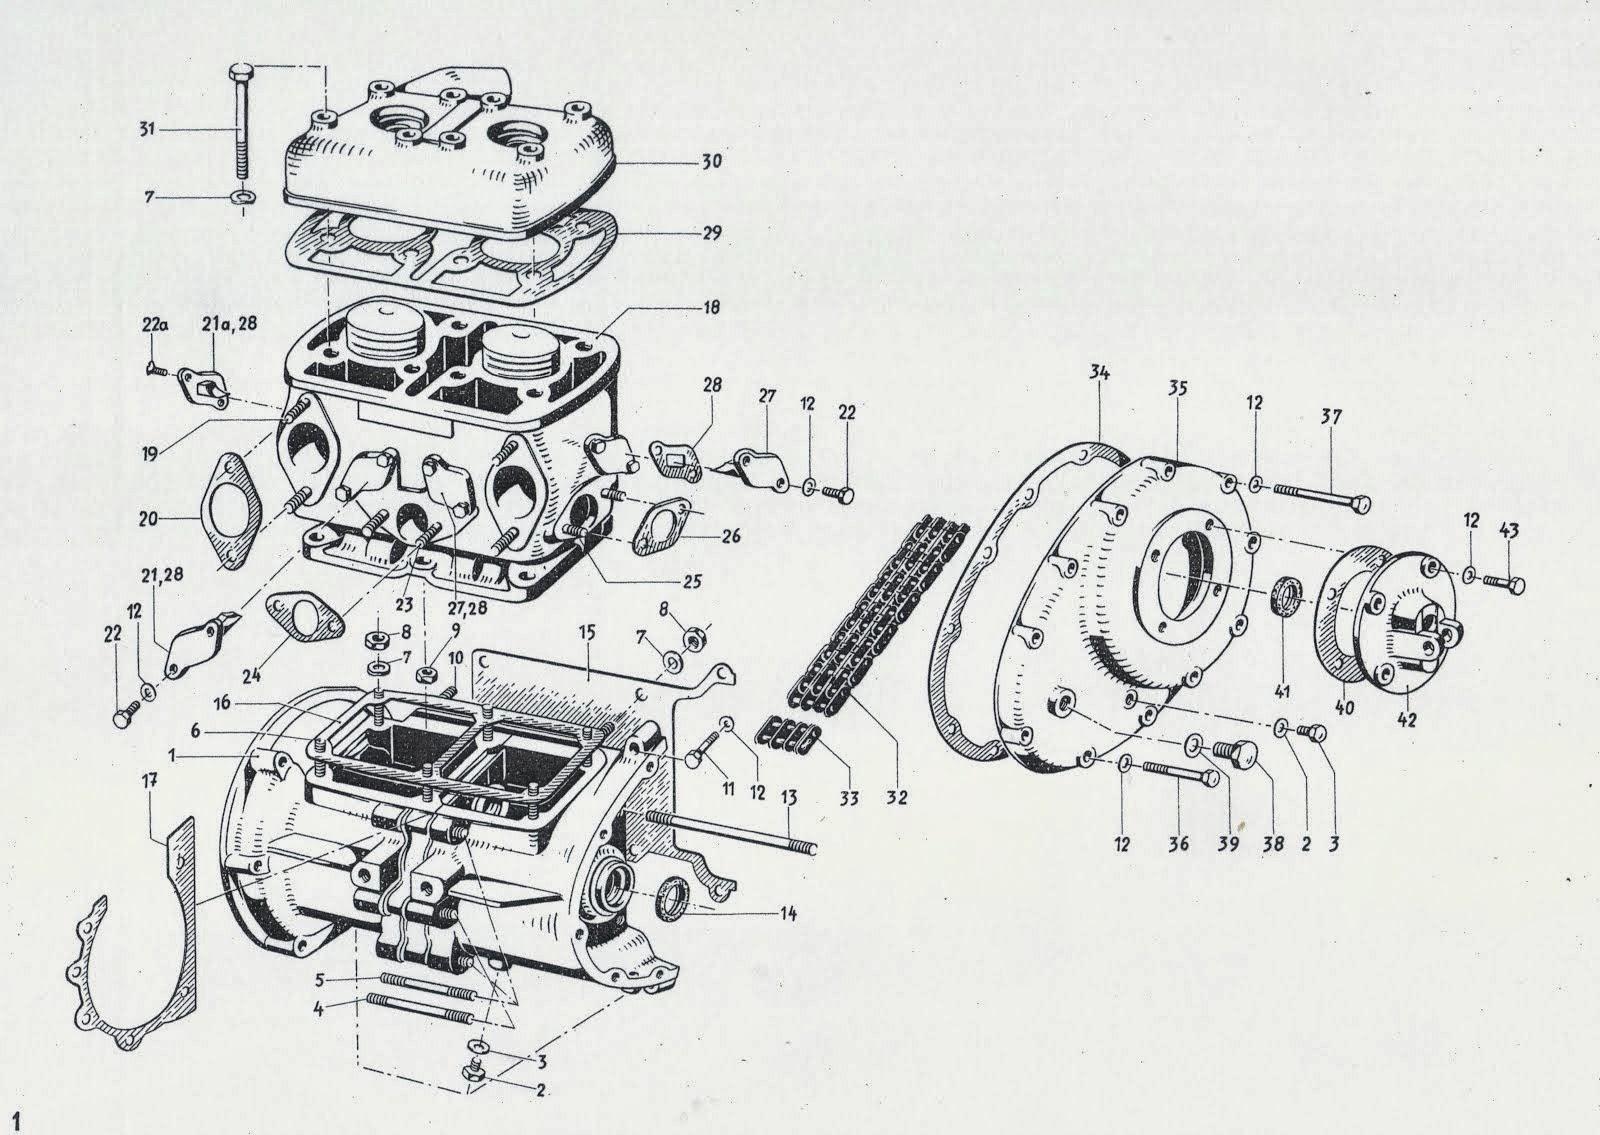 Project Tempo: 1950 Tempo Hanseat Teilelist